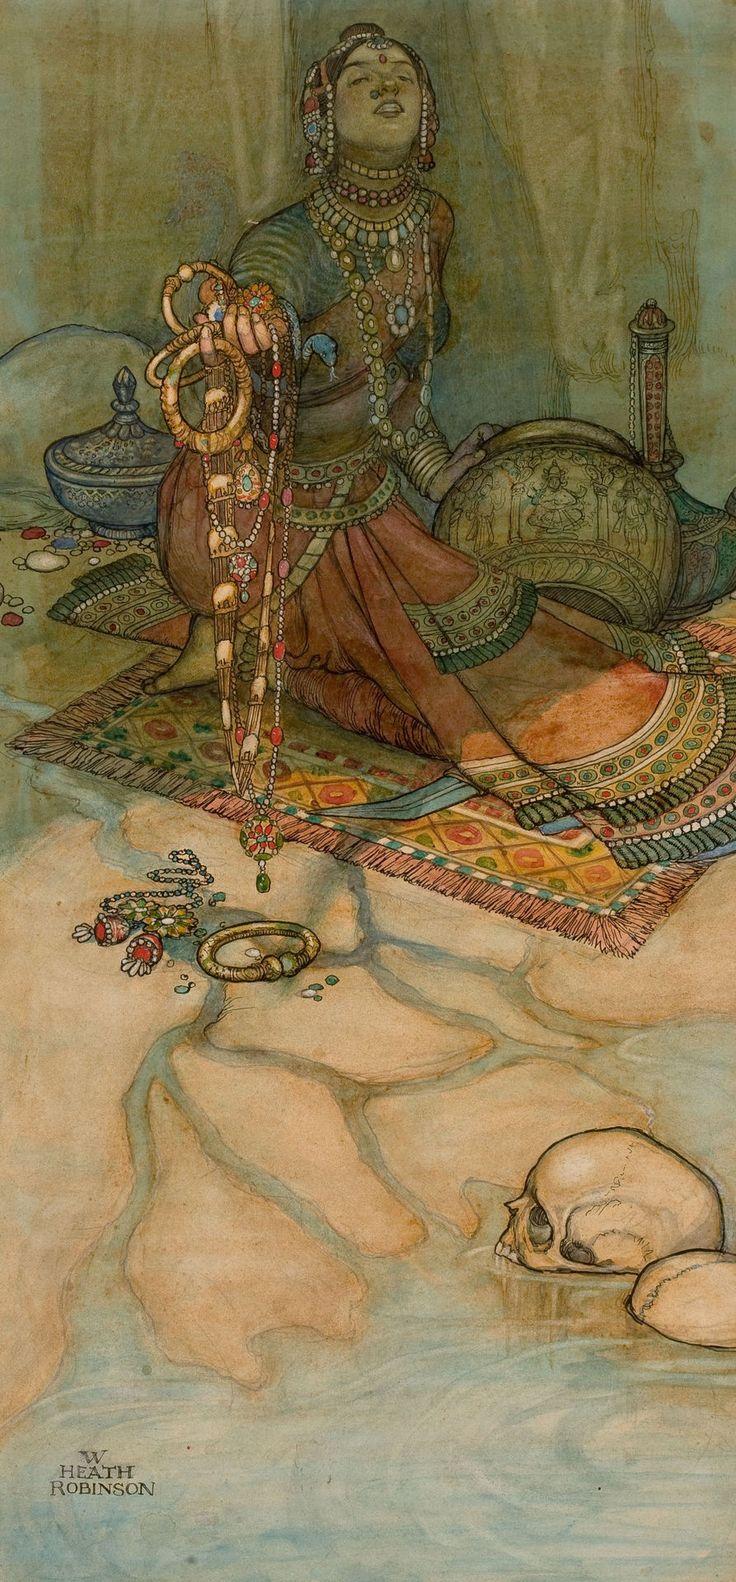 Oriental illustration WILLIAM HEATH ROBINSON